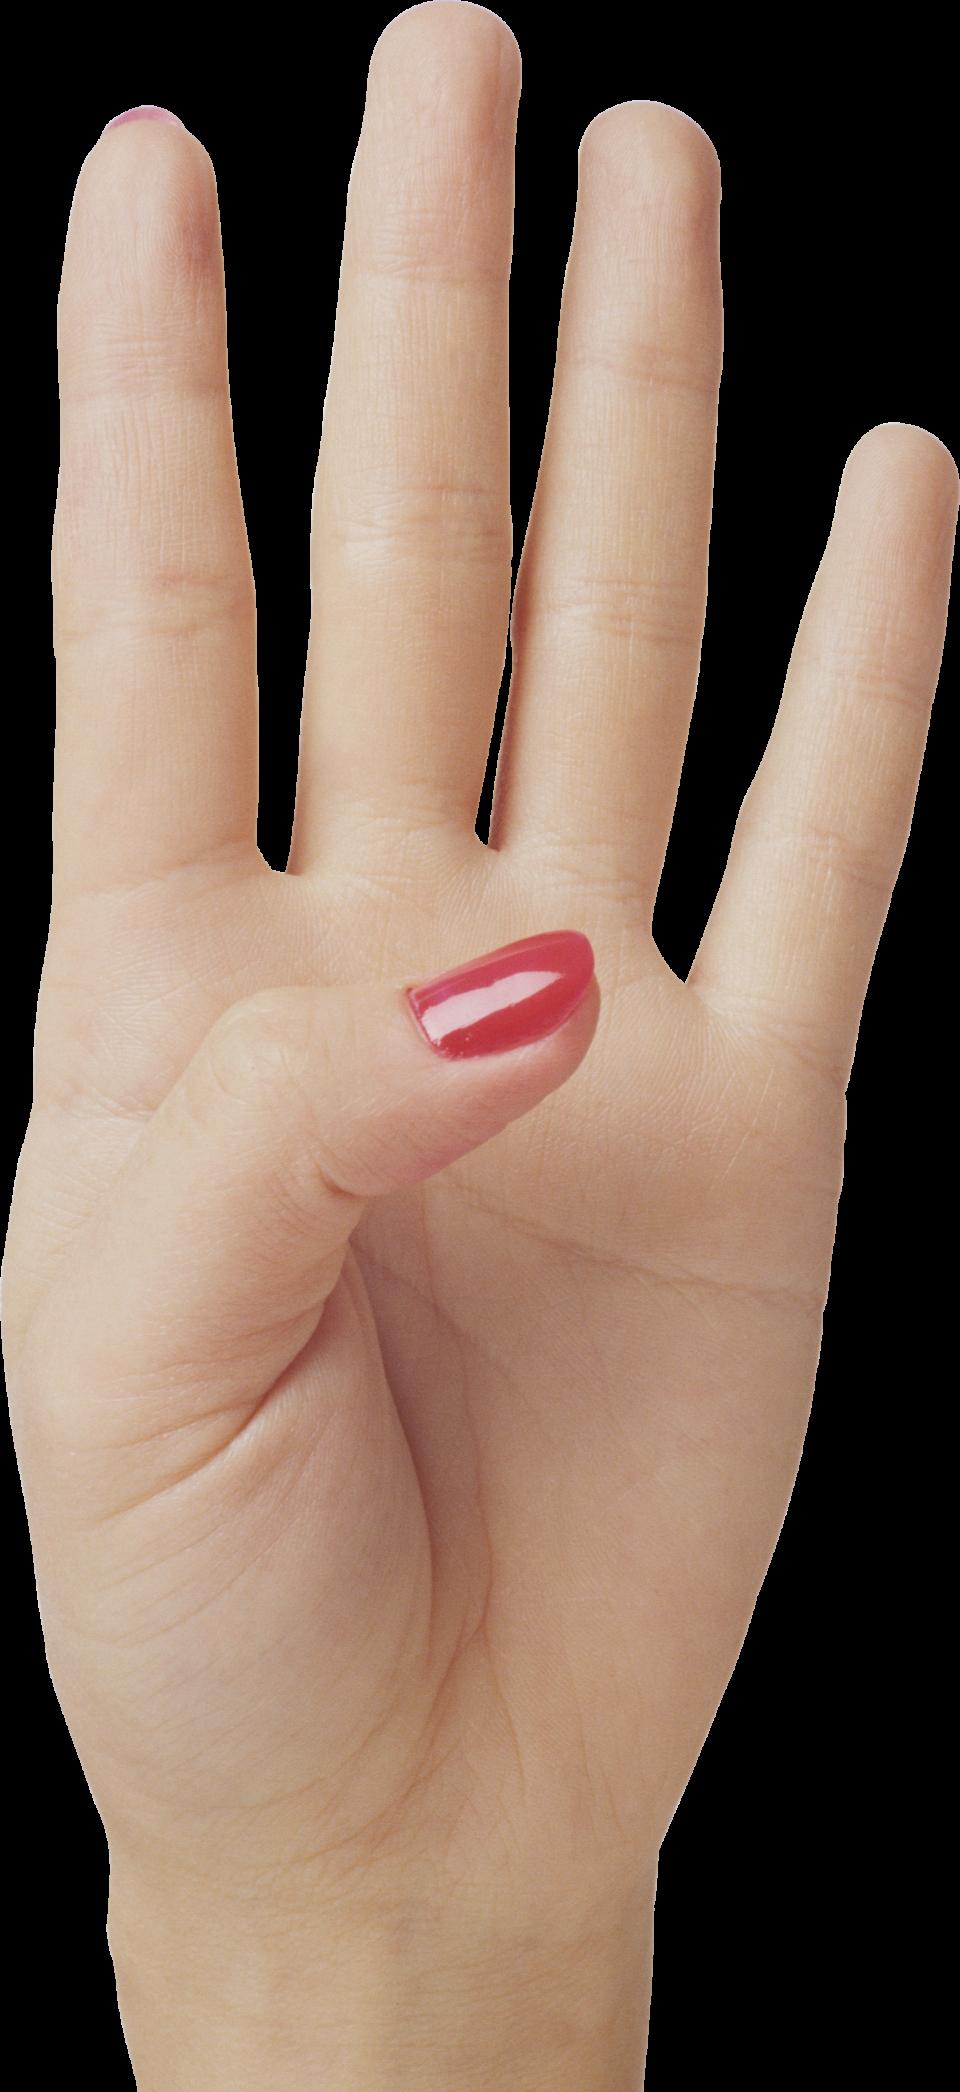 Four Finger Hand PNG Image